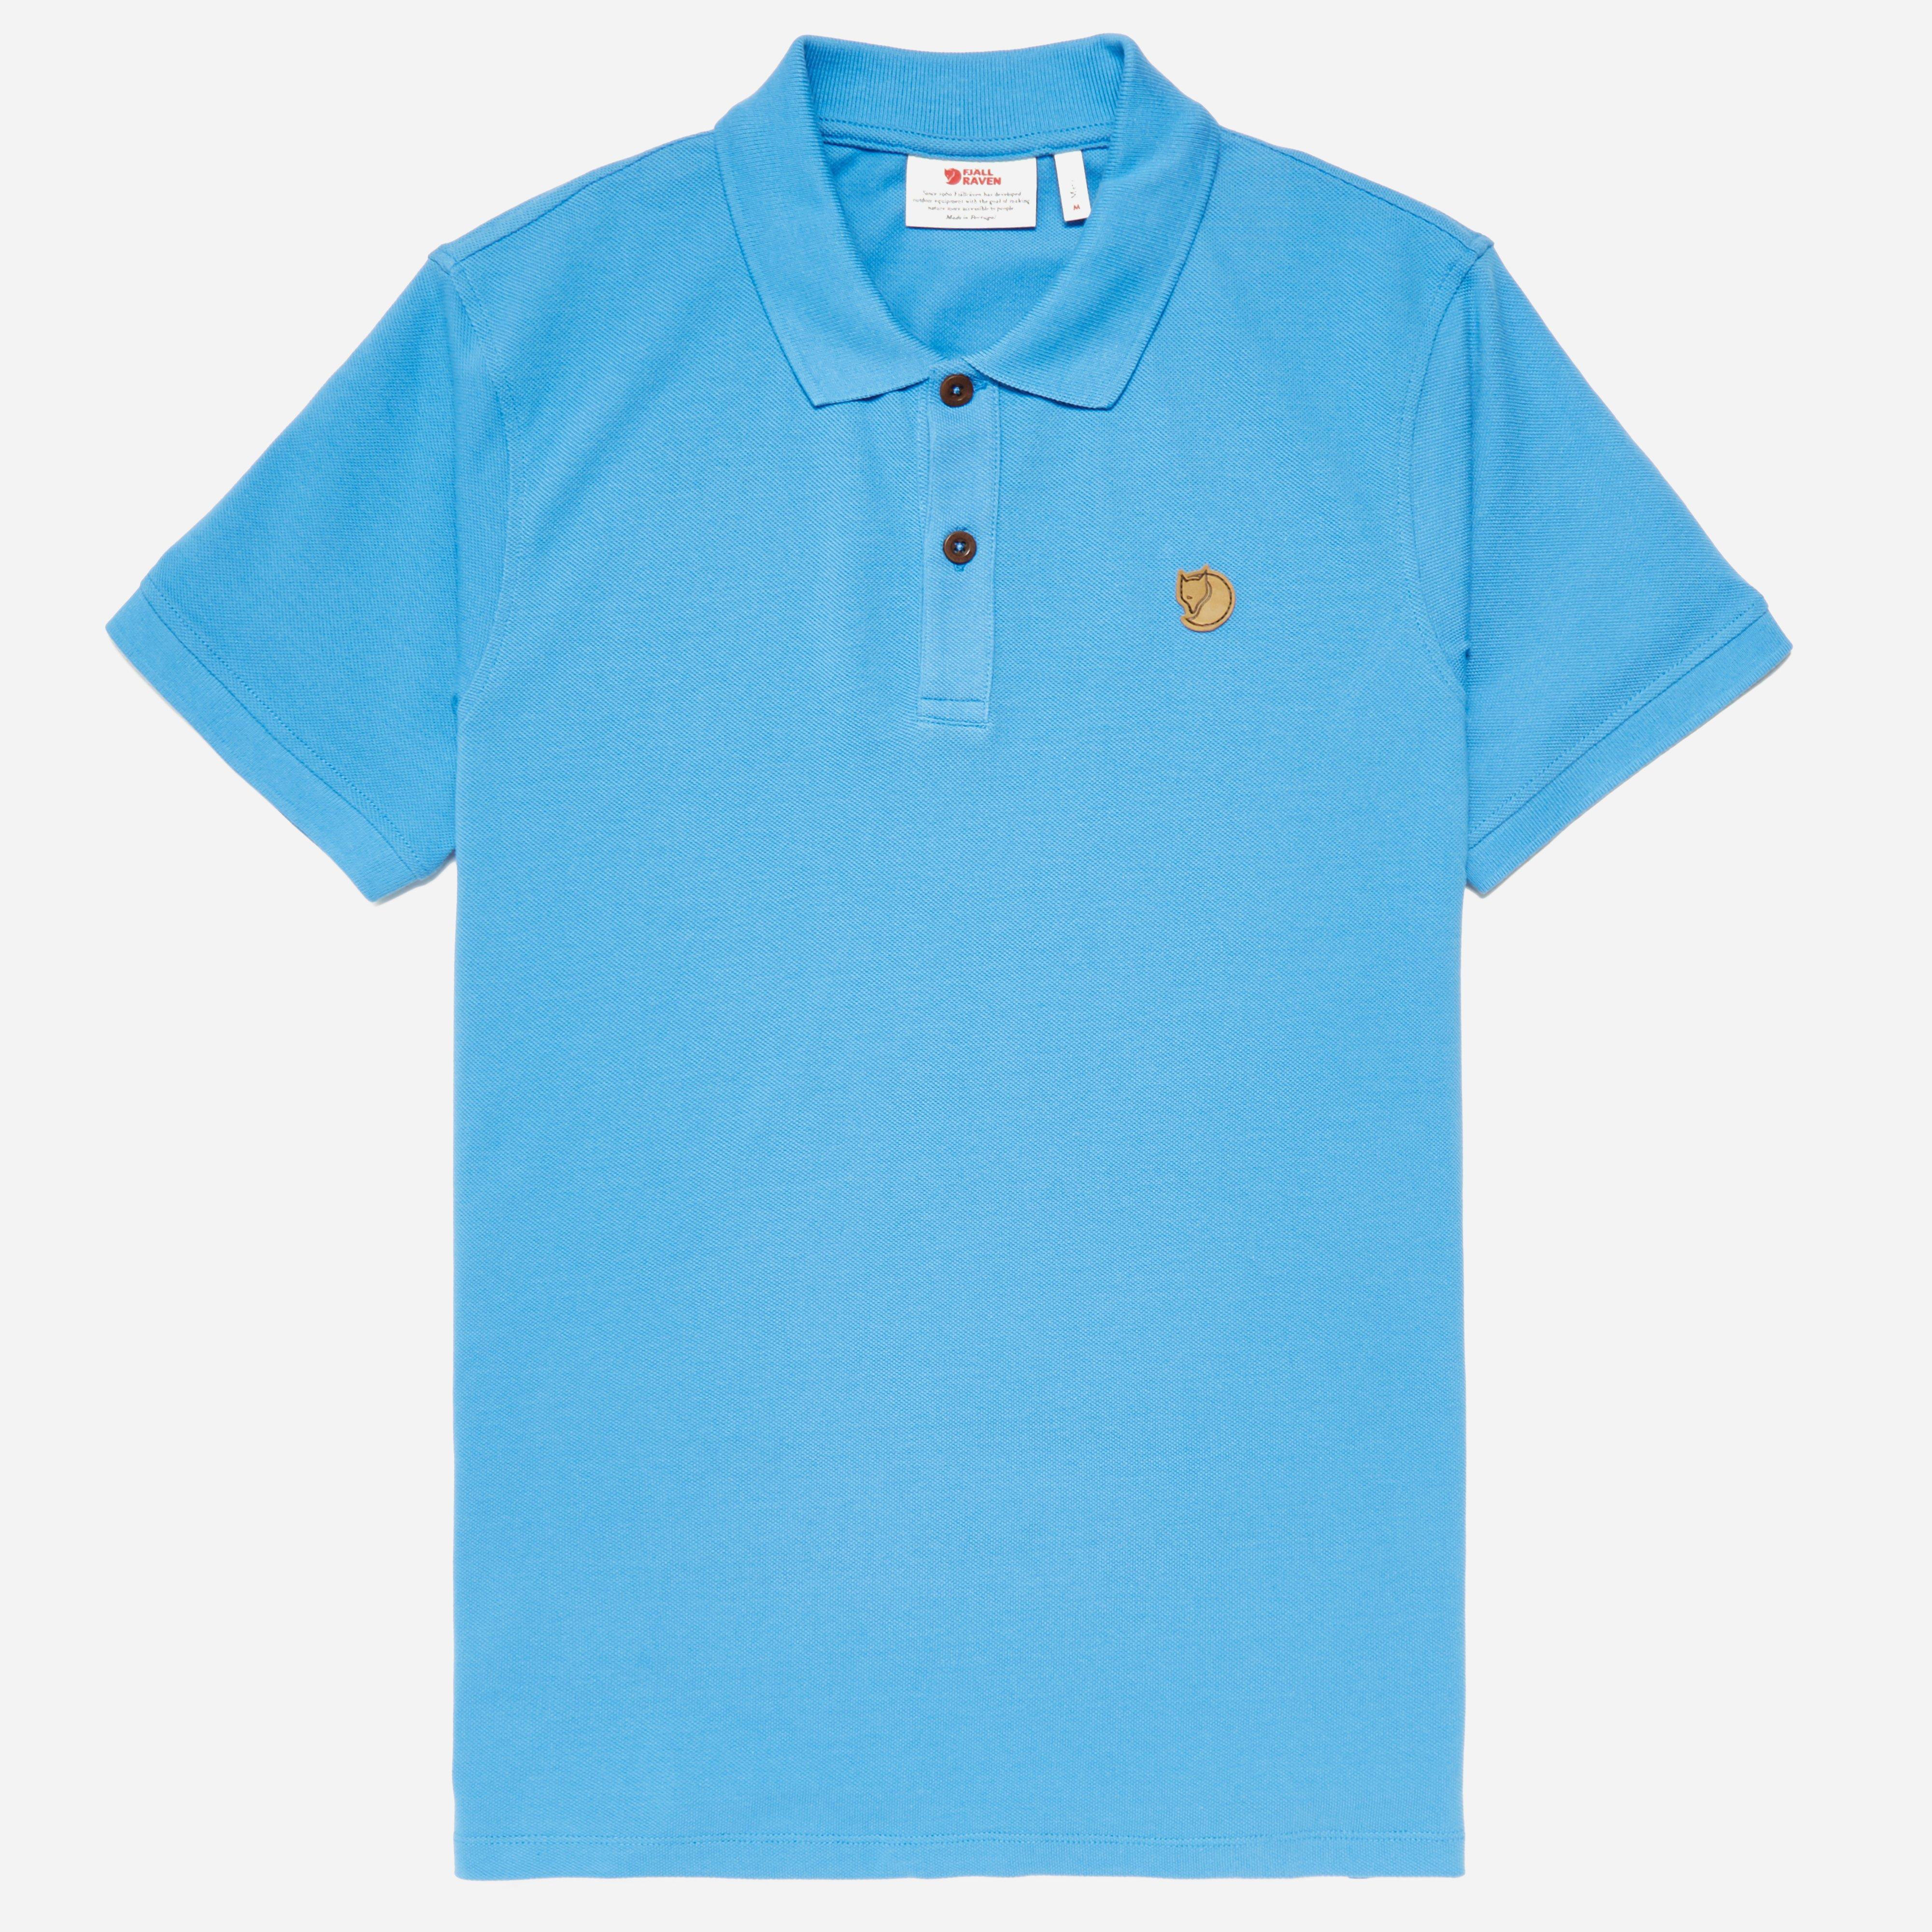 Fjallraven Ovik Polo Shirt